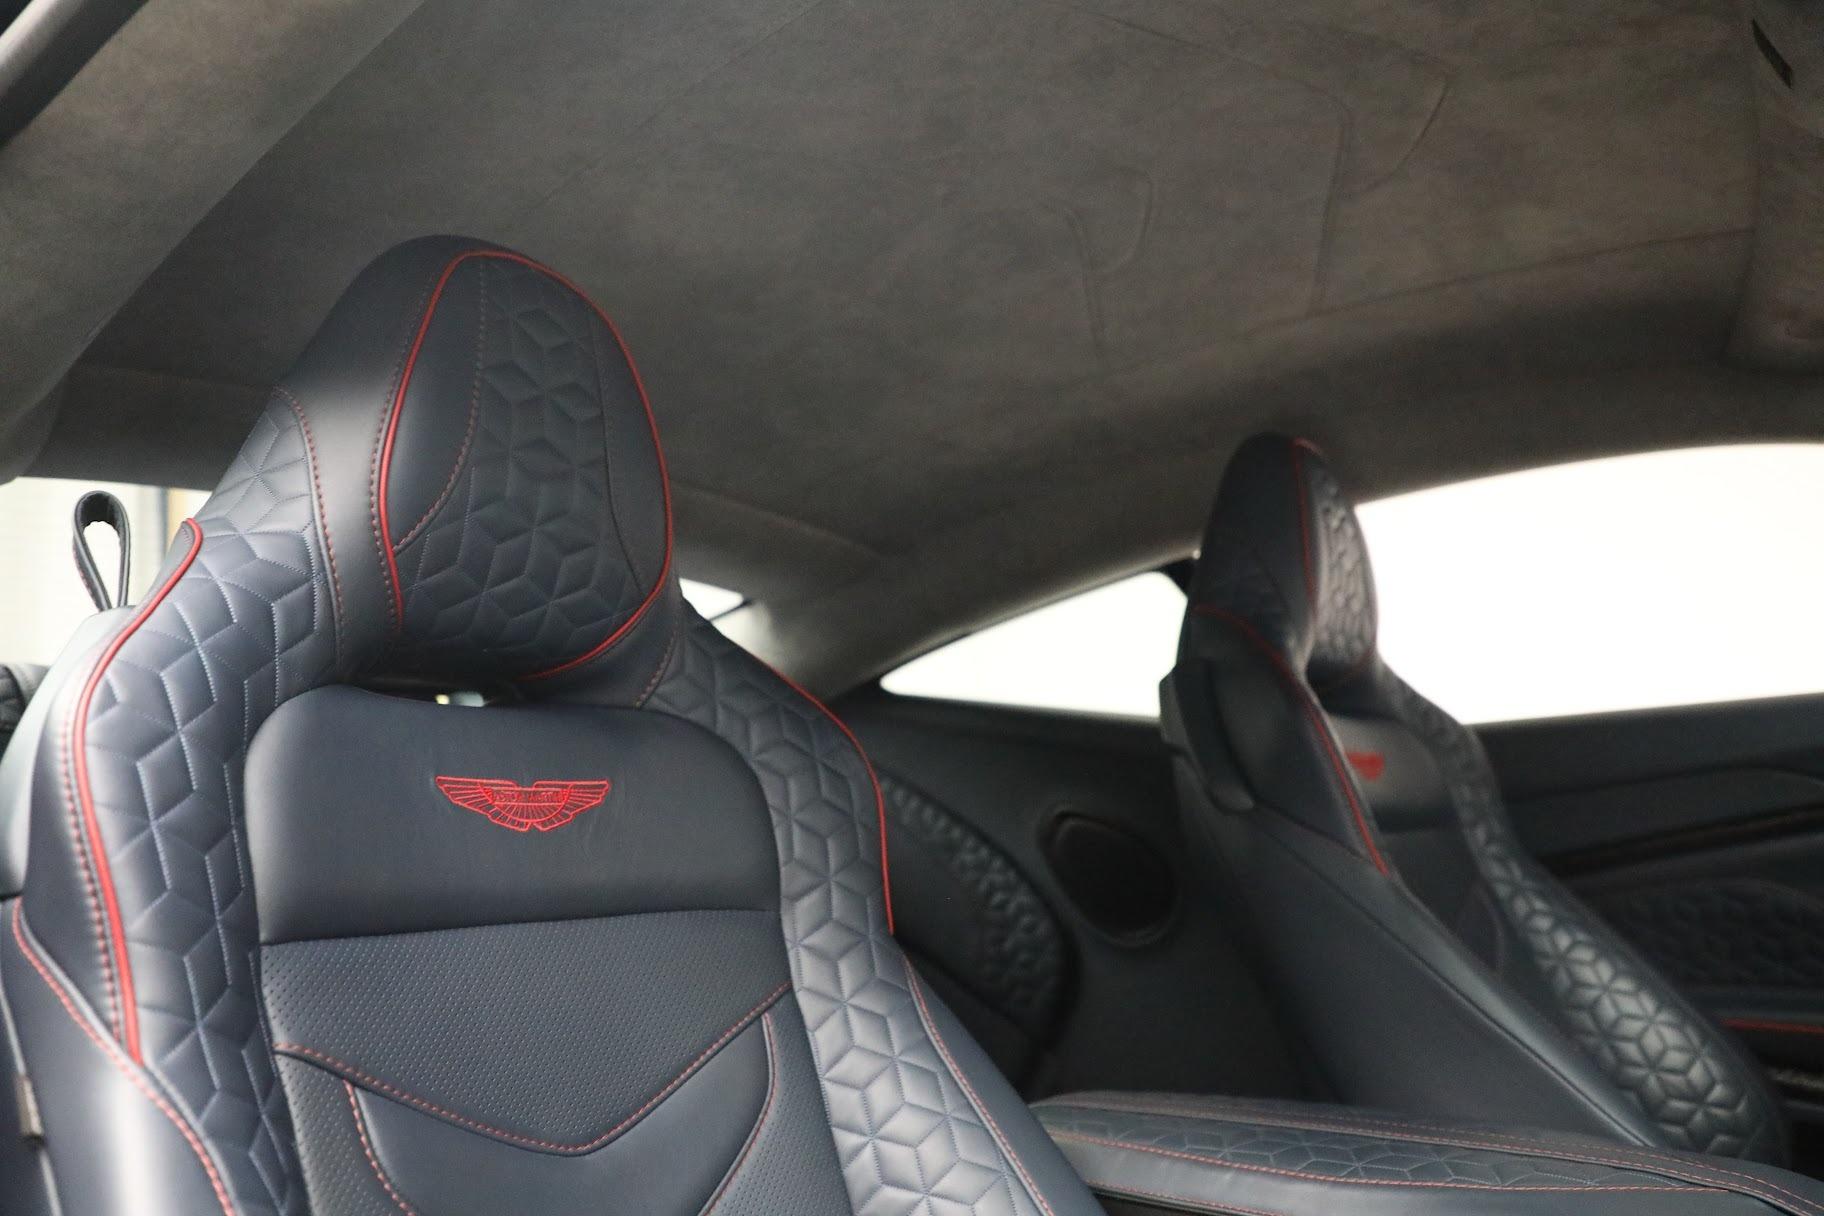 Used 2019 Aston Martin DBS Superleggera For Sale In Westport, CT 3471_p18